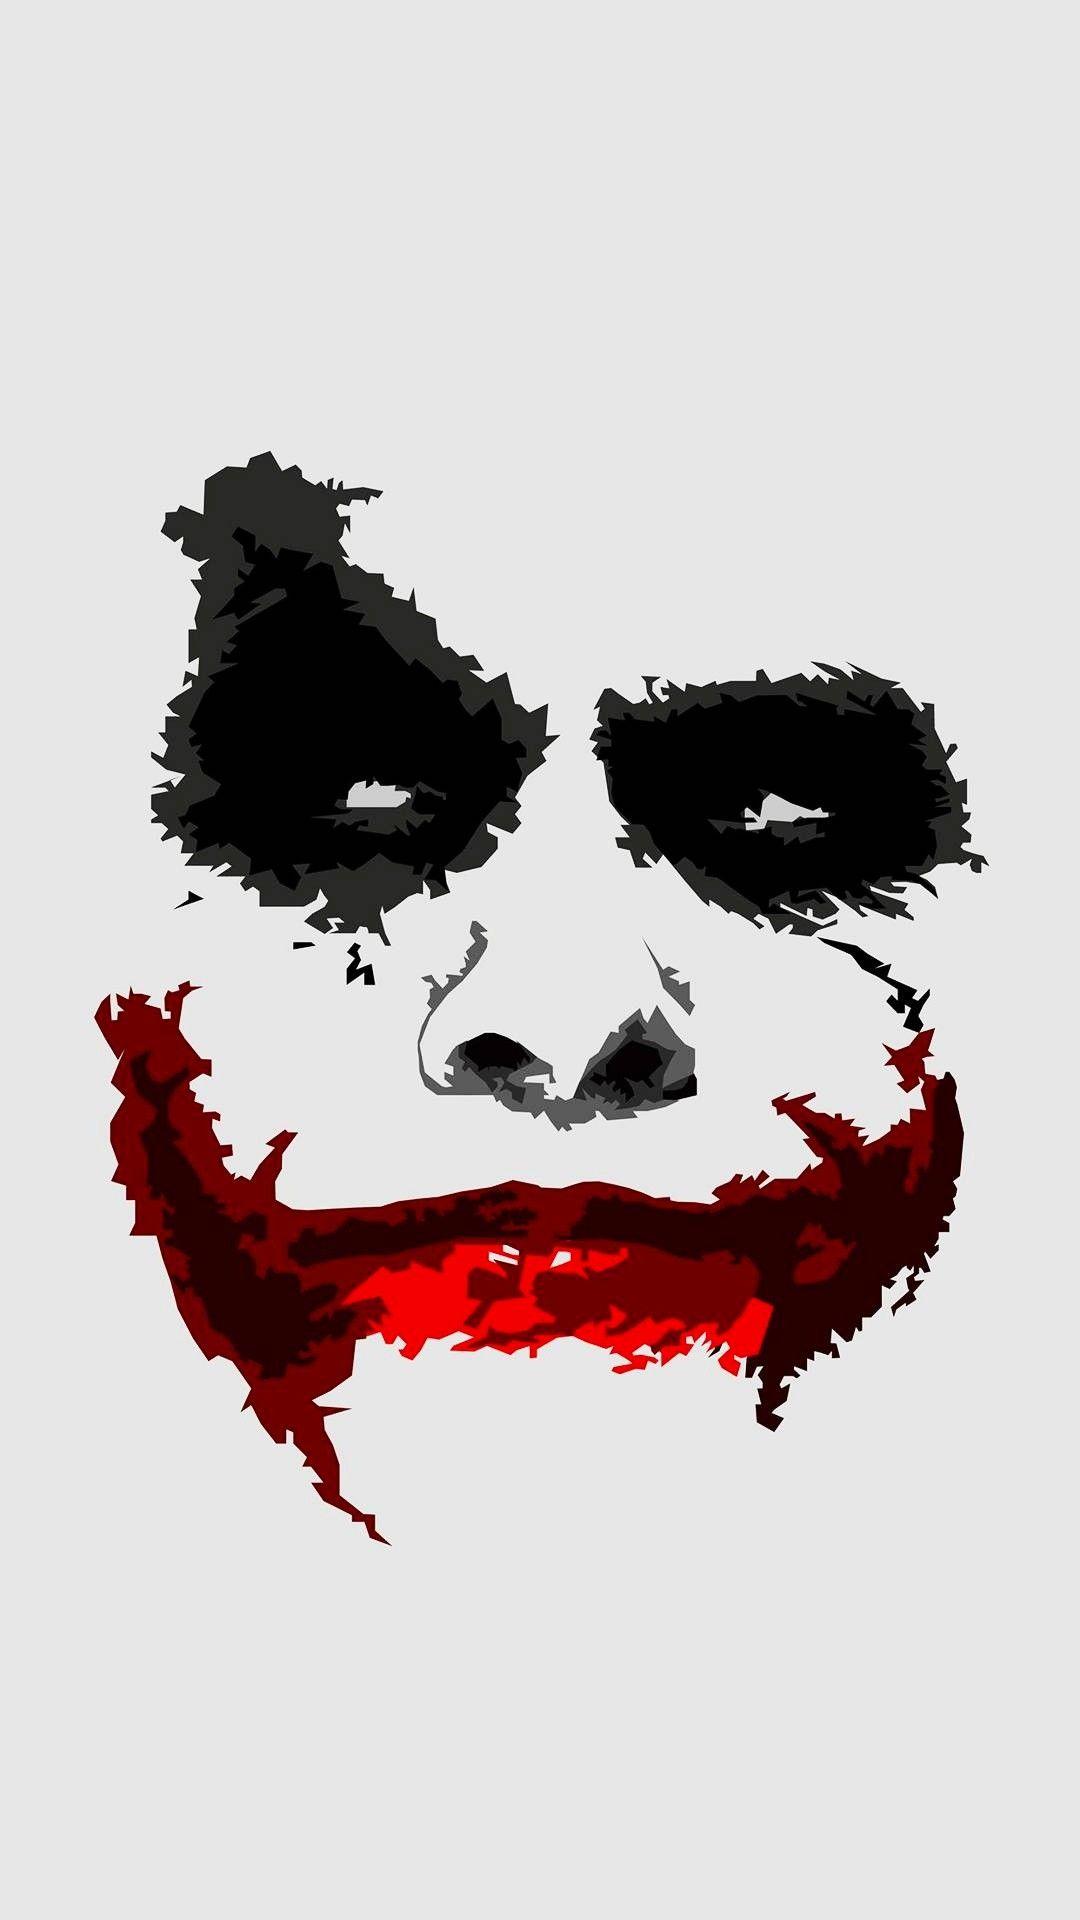 Joker Hd Wallpaper Dc Lovers Joker Wallpapers Joker Joker